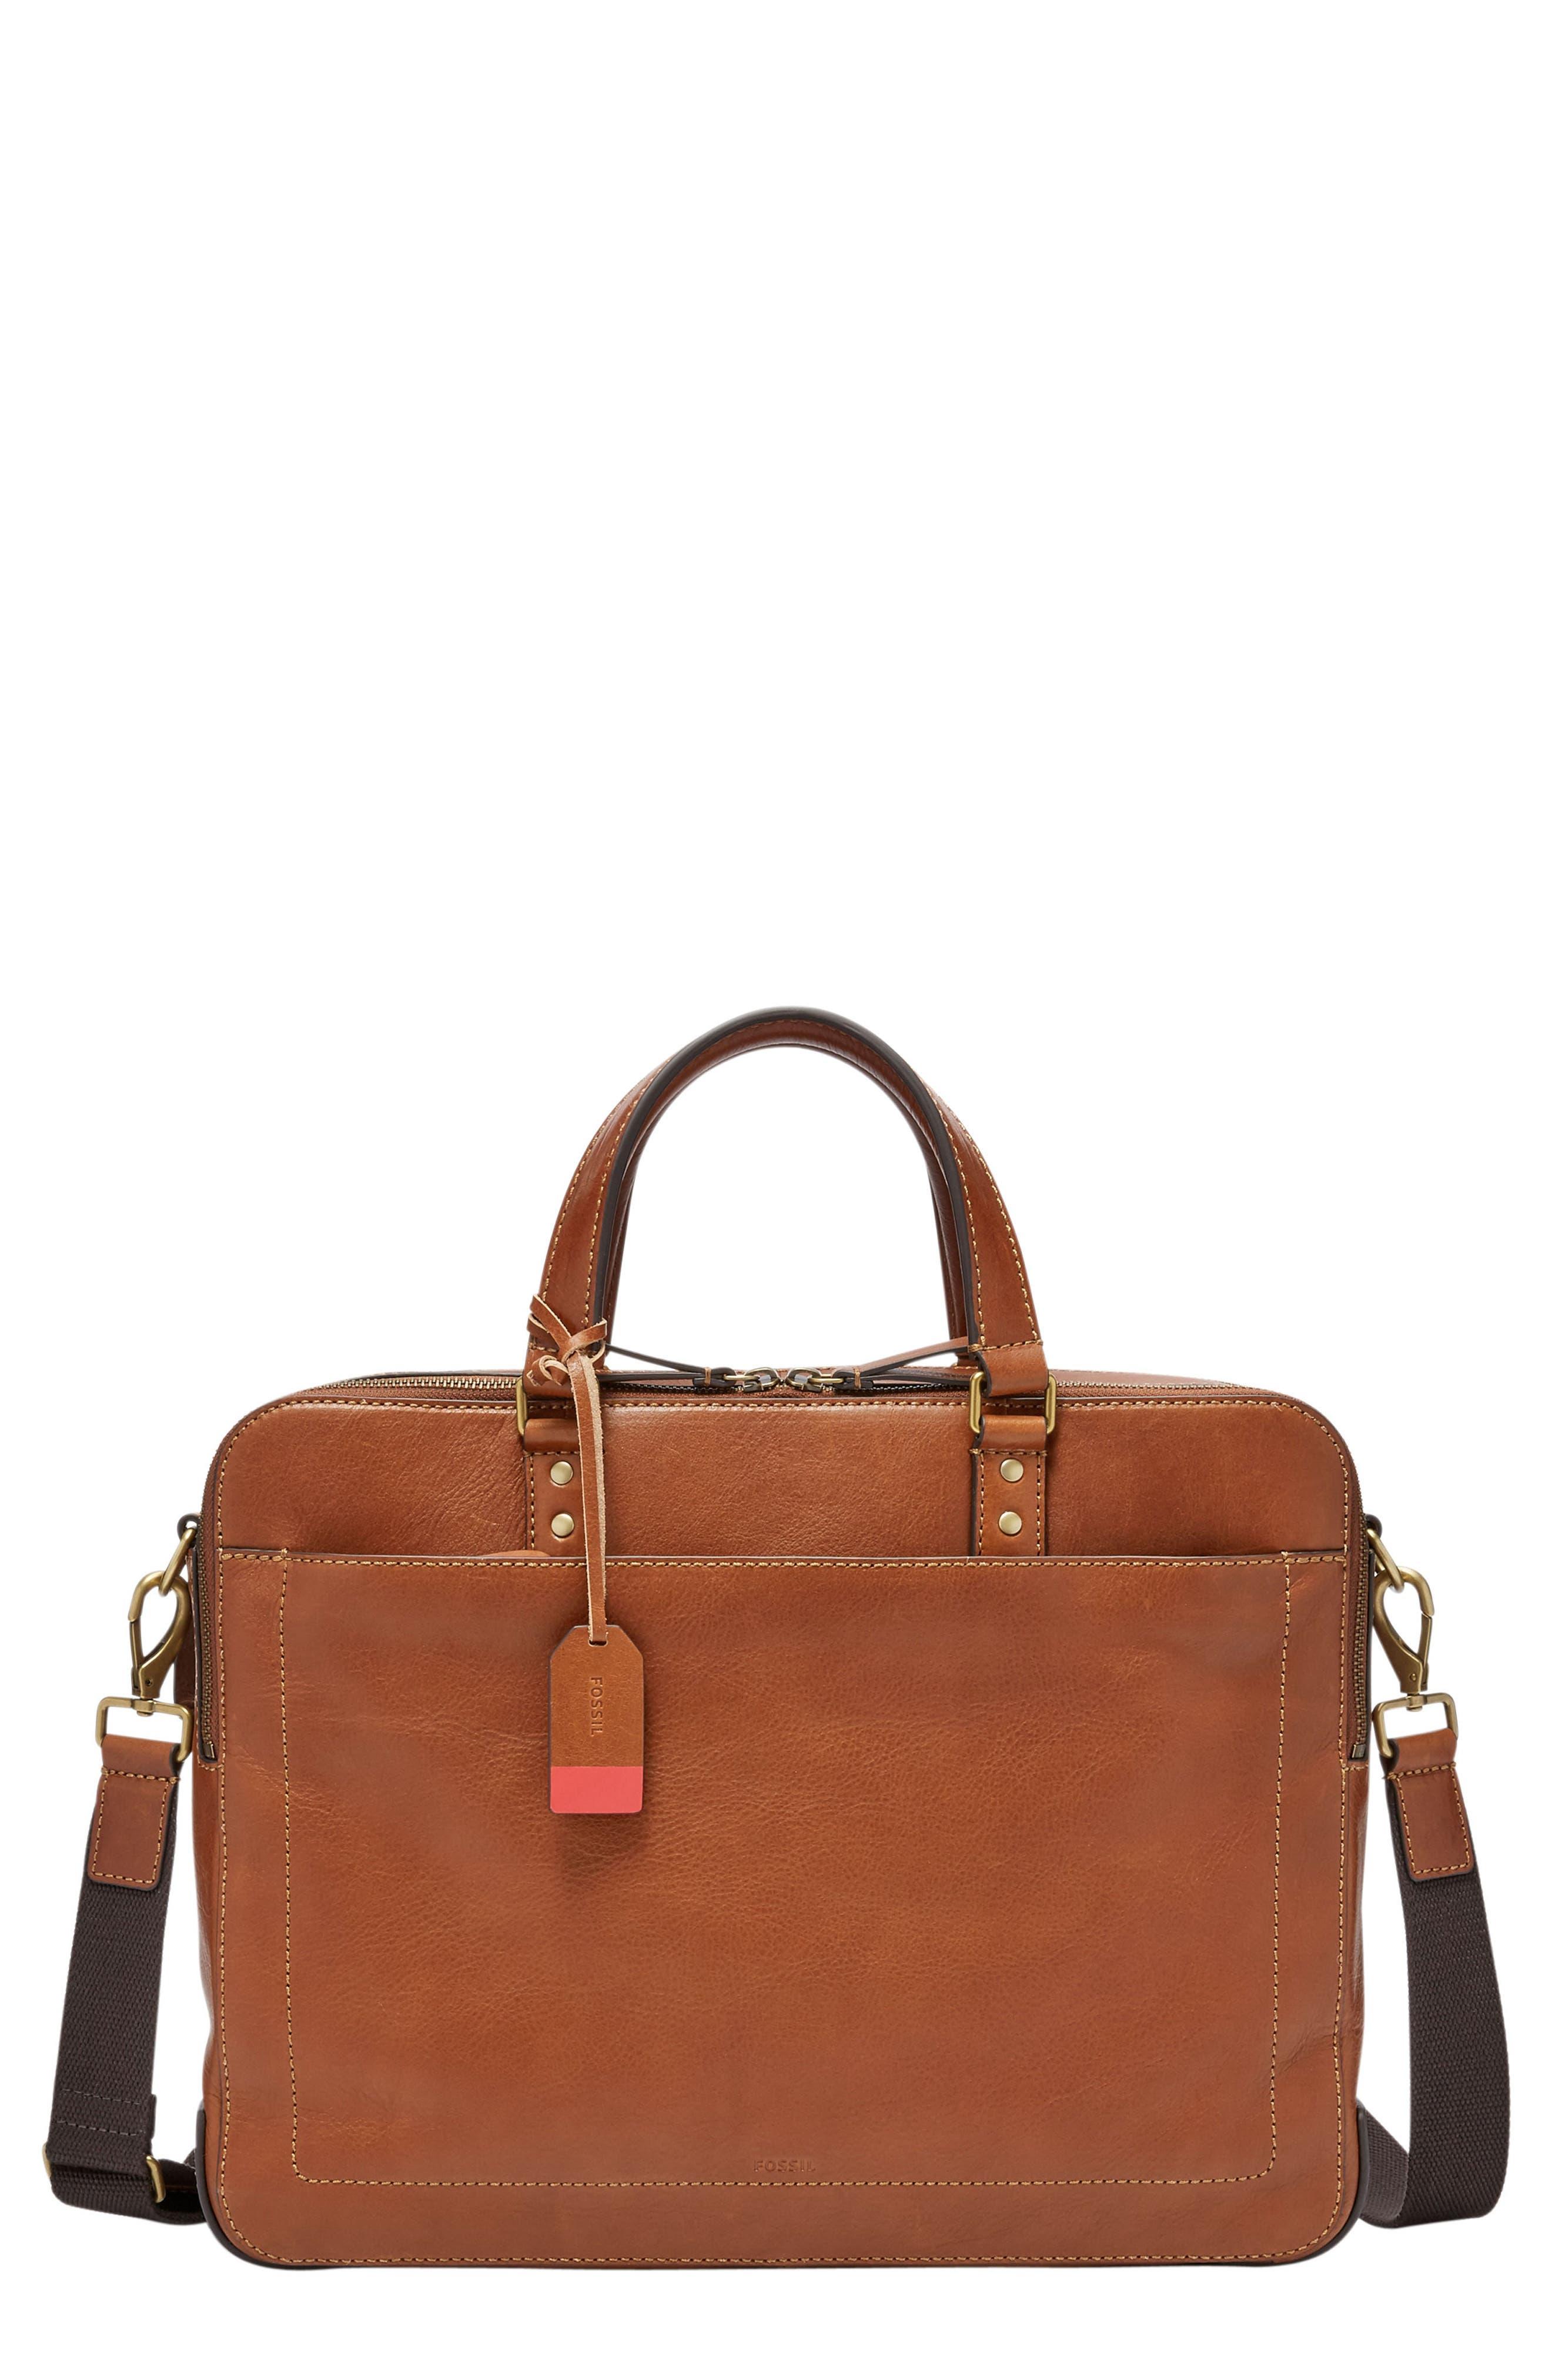 Fossil Bags & Wallets for Men | Nordstrom